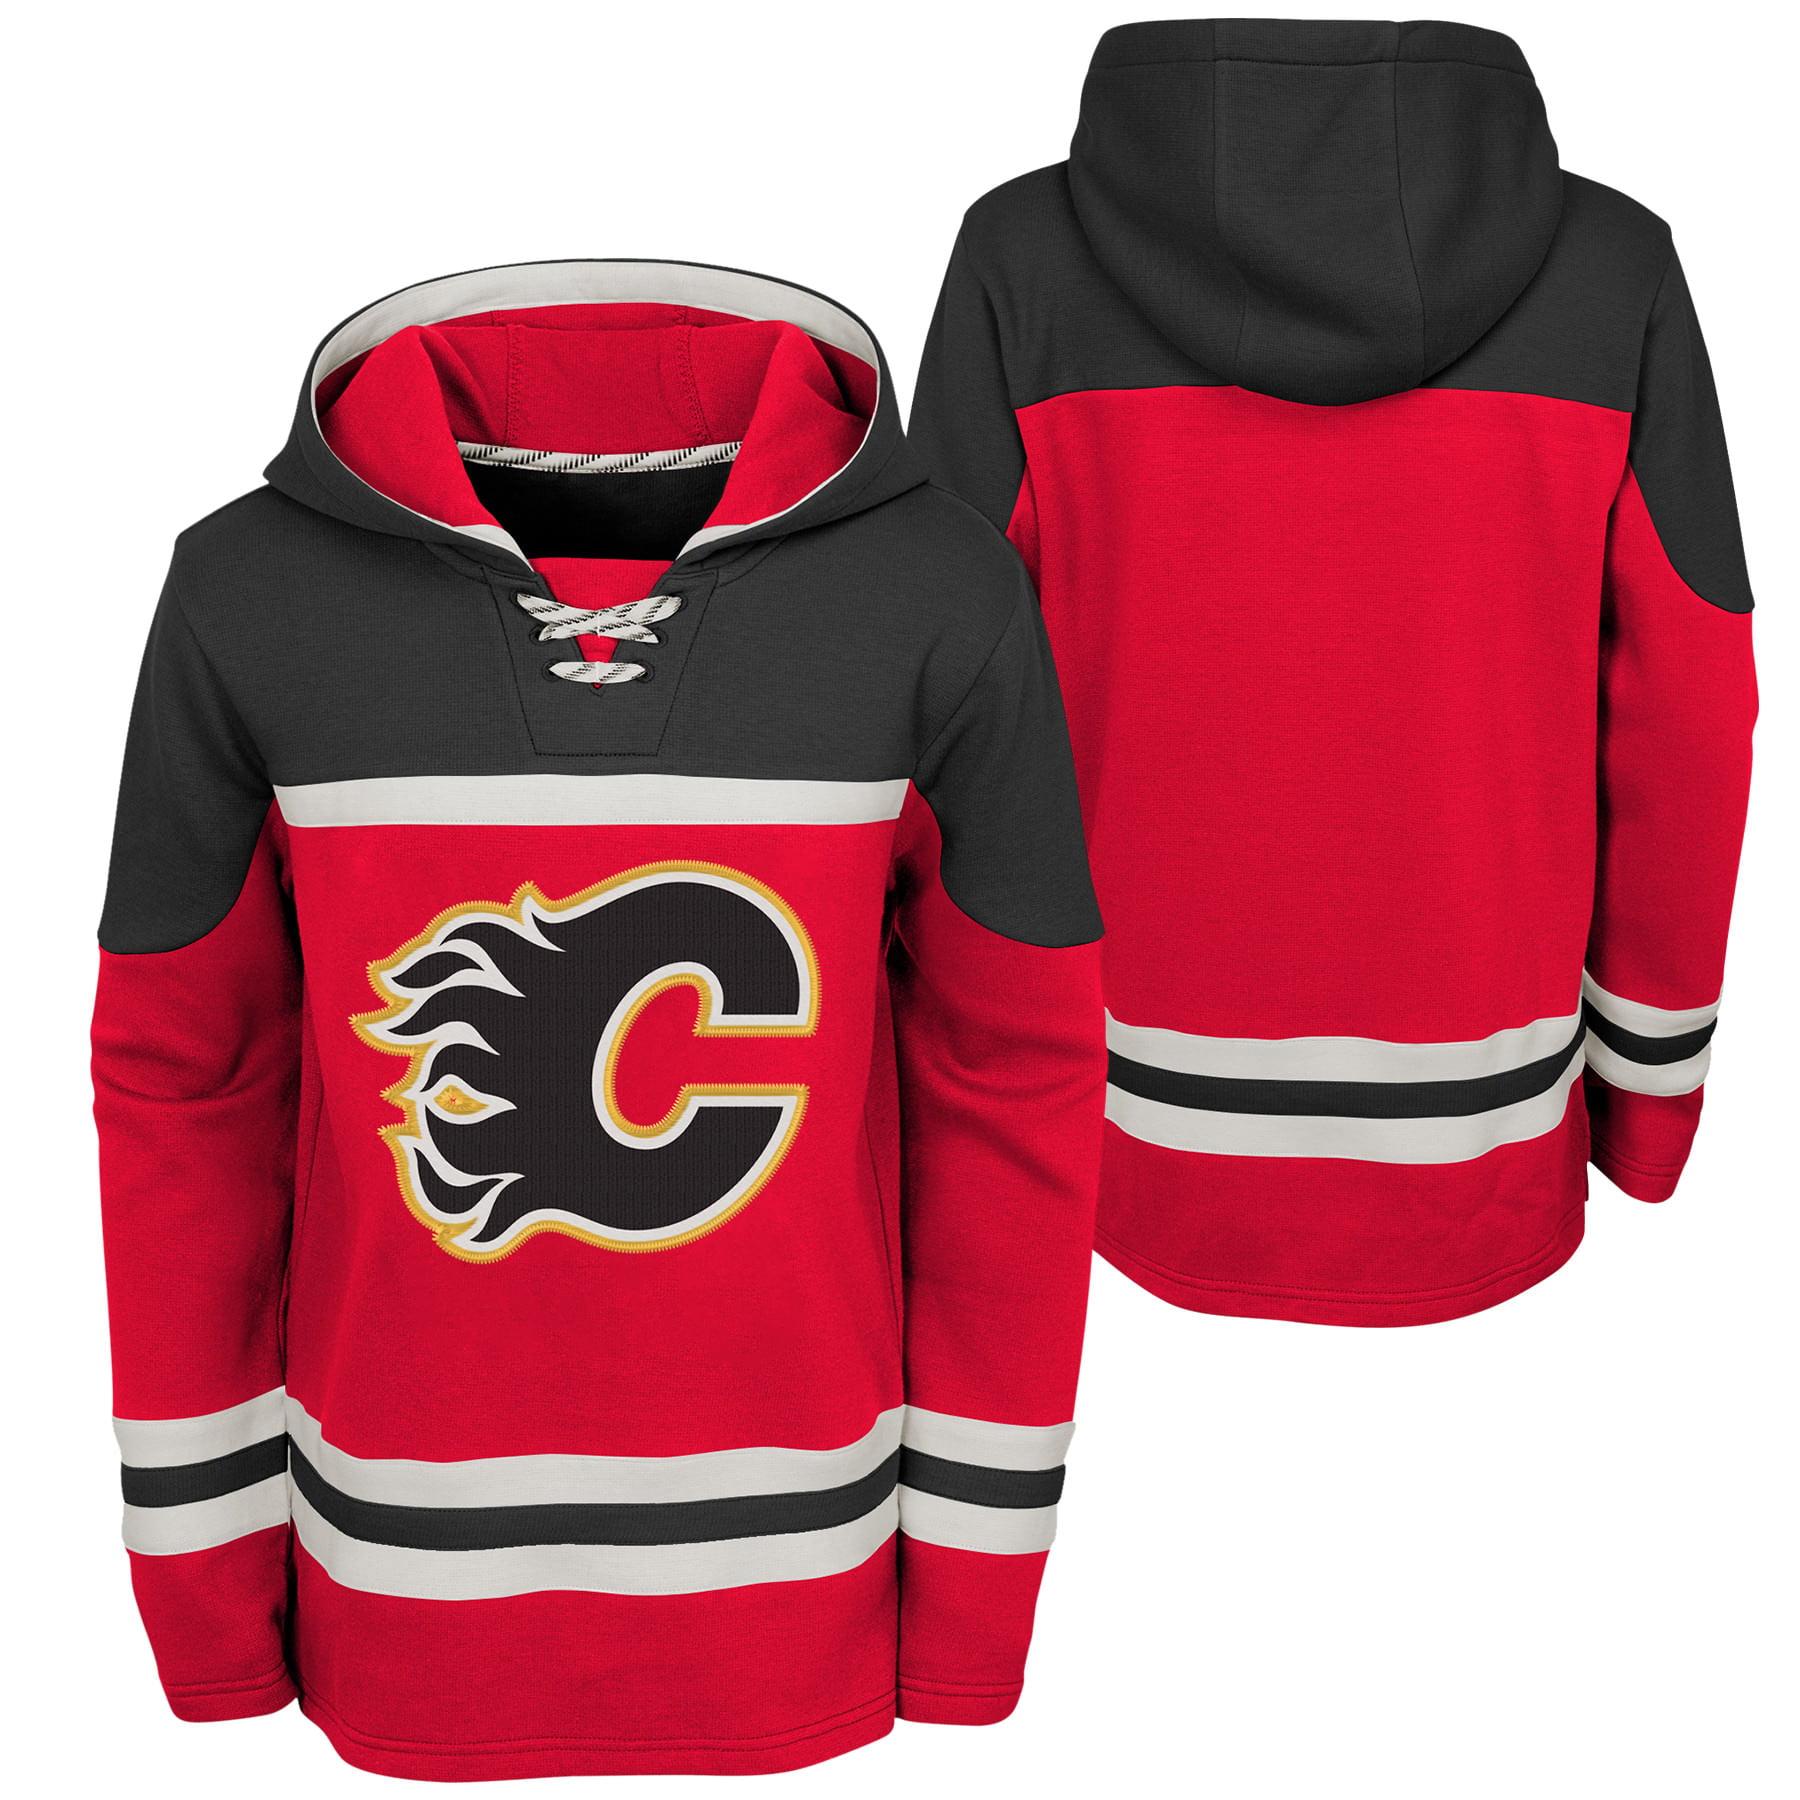 Outerstuff Youth Calgary Flames NHL Asset Hockey Hoodie 6e0ee3a0fc